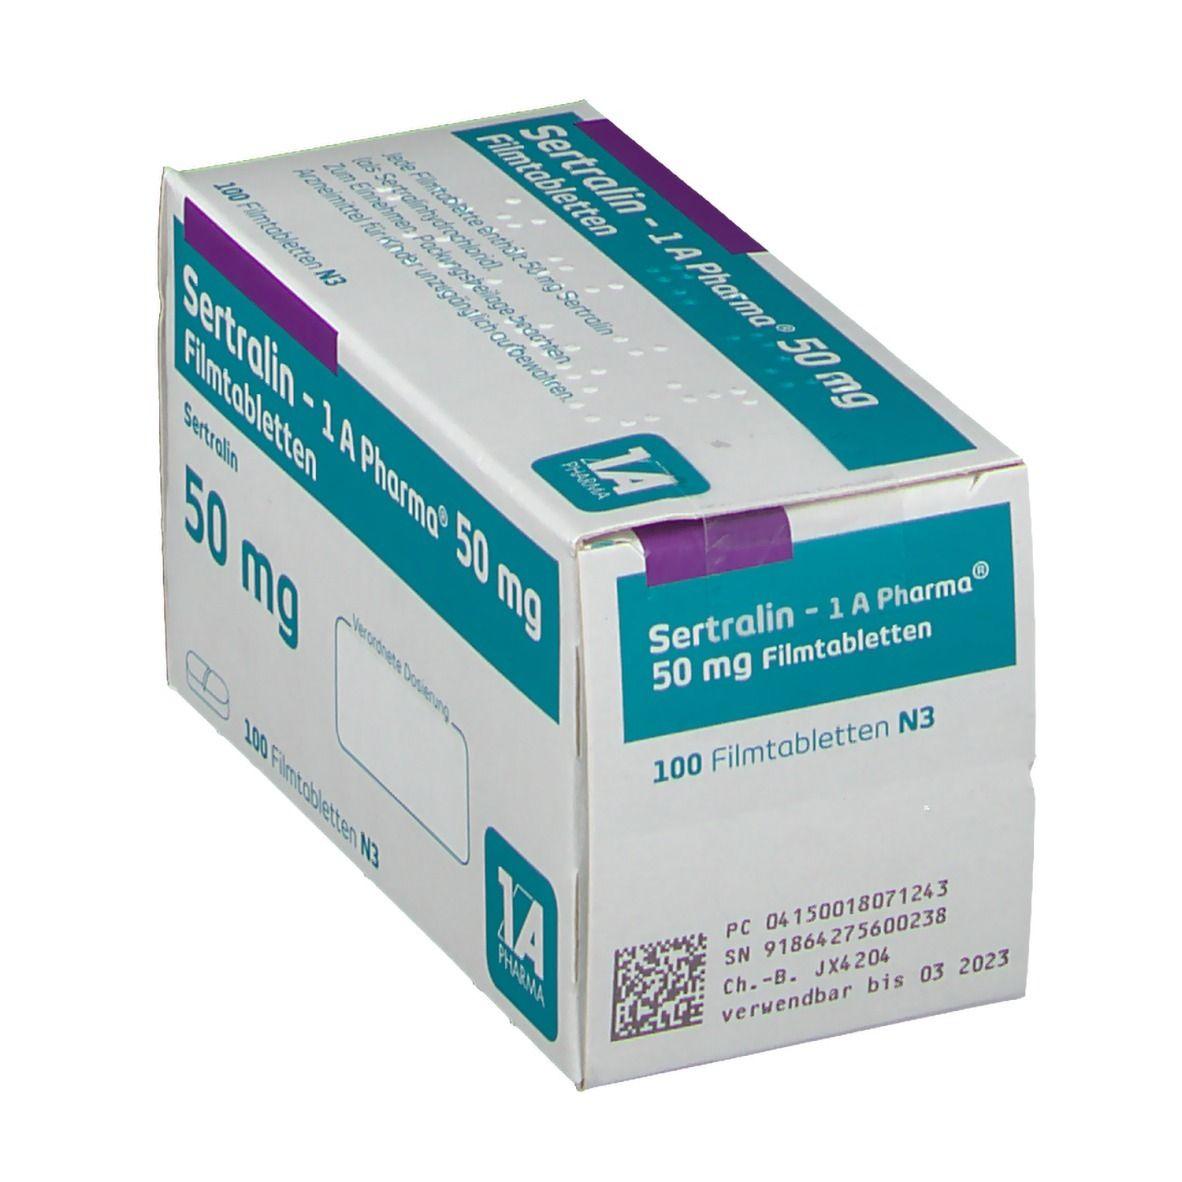 SERTRALIN 1A Pharma 50 mg